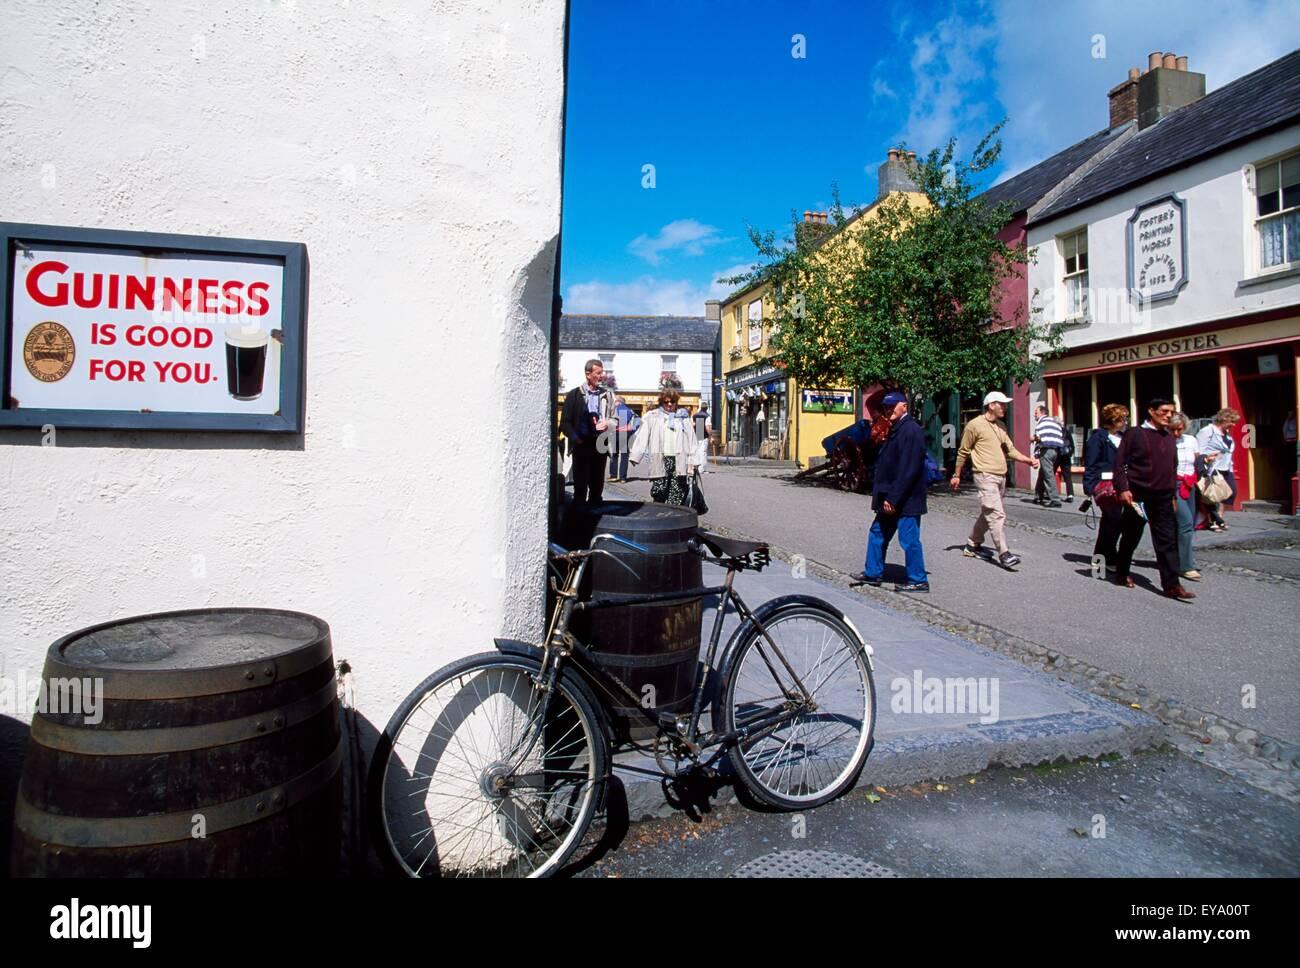 Folk Park, Bunratty, Co Clare, Ireland - Stock Image